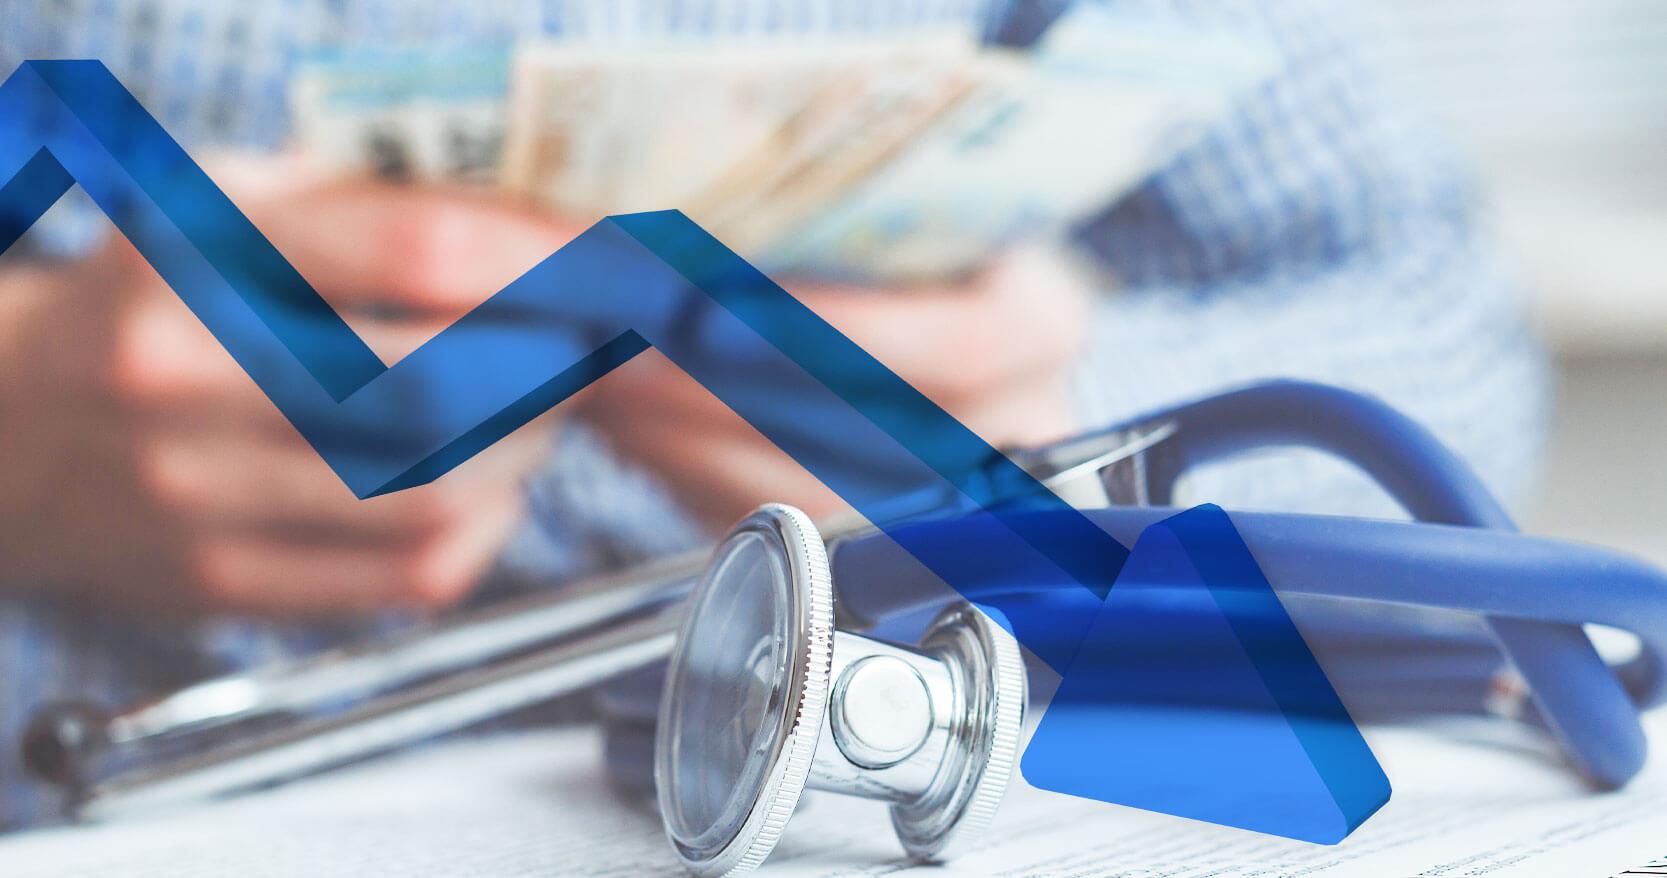 7 ralos financeiros dentro do seu consultório médico e como evitá-los